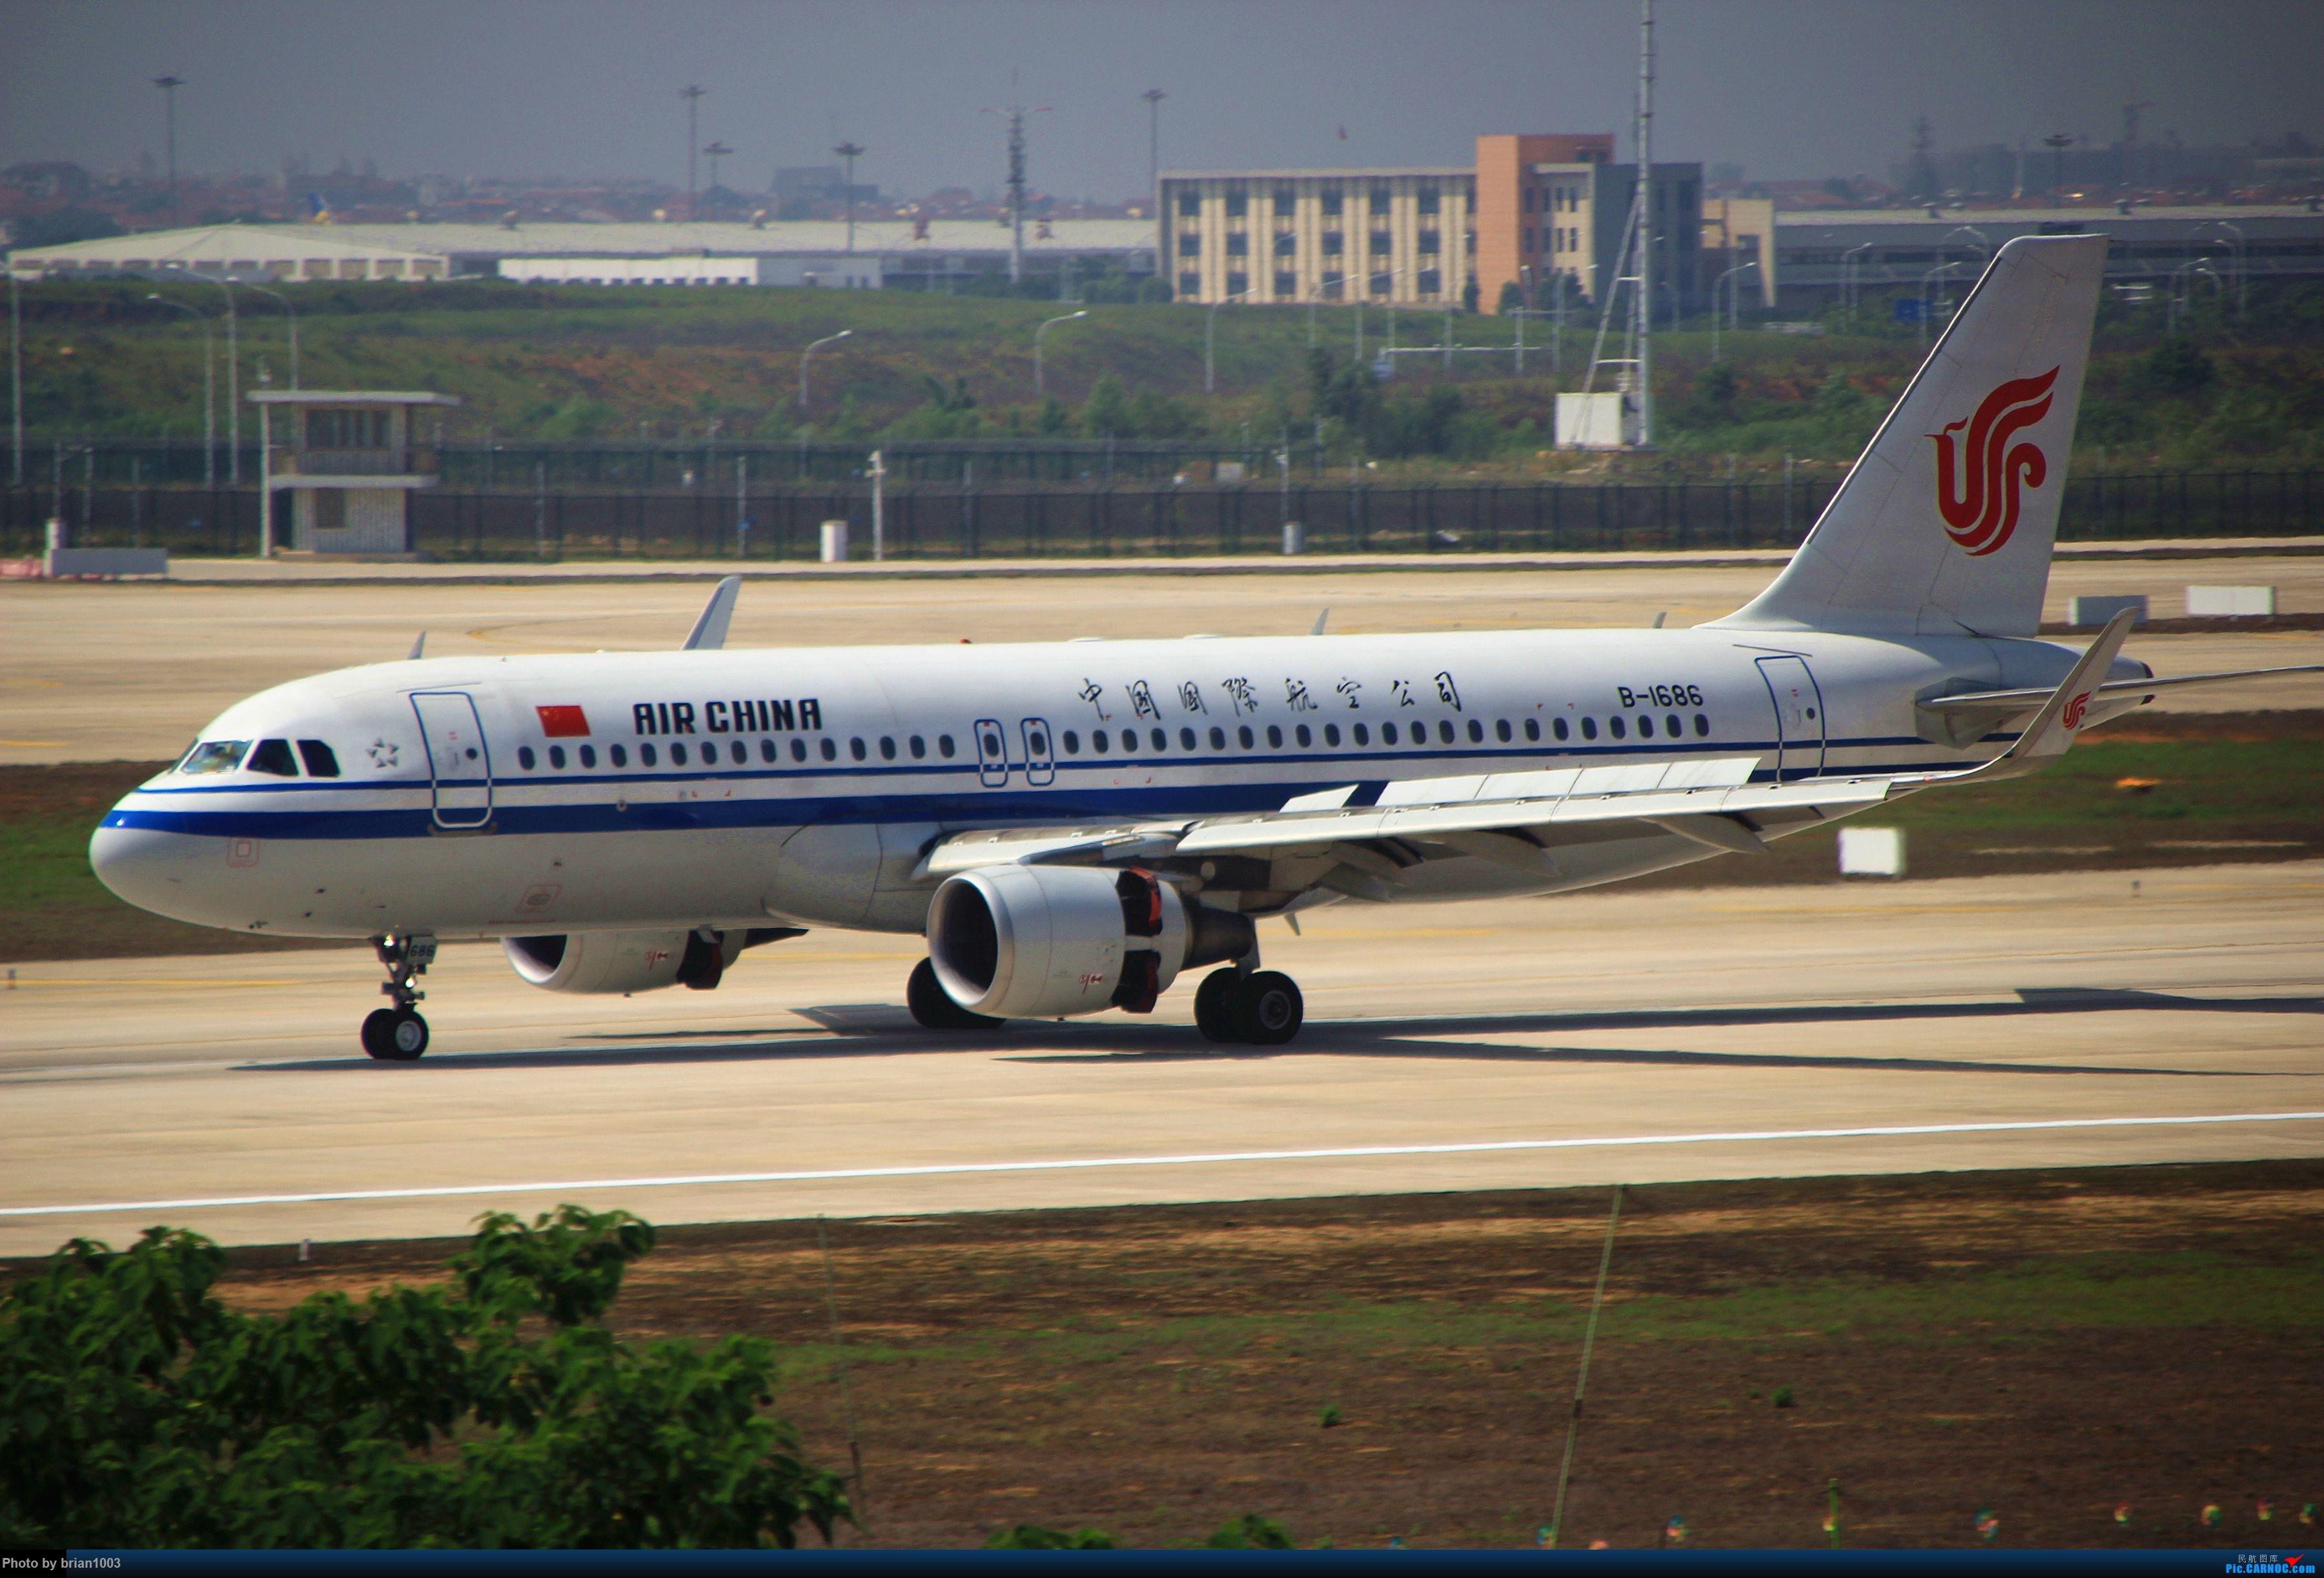 Re:[原创]WUH武汉天河机场拍机之喜迎酷航788和偶遇某其他飞机 AIRBUS A320-200 B-1686